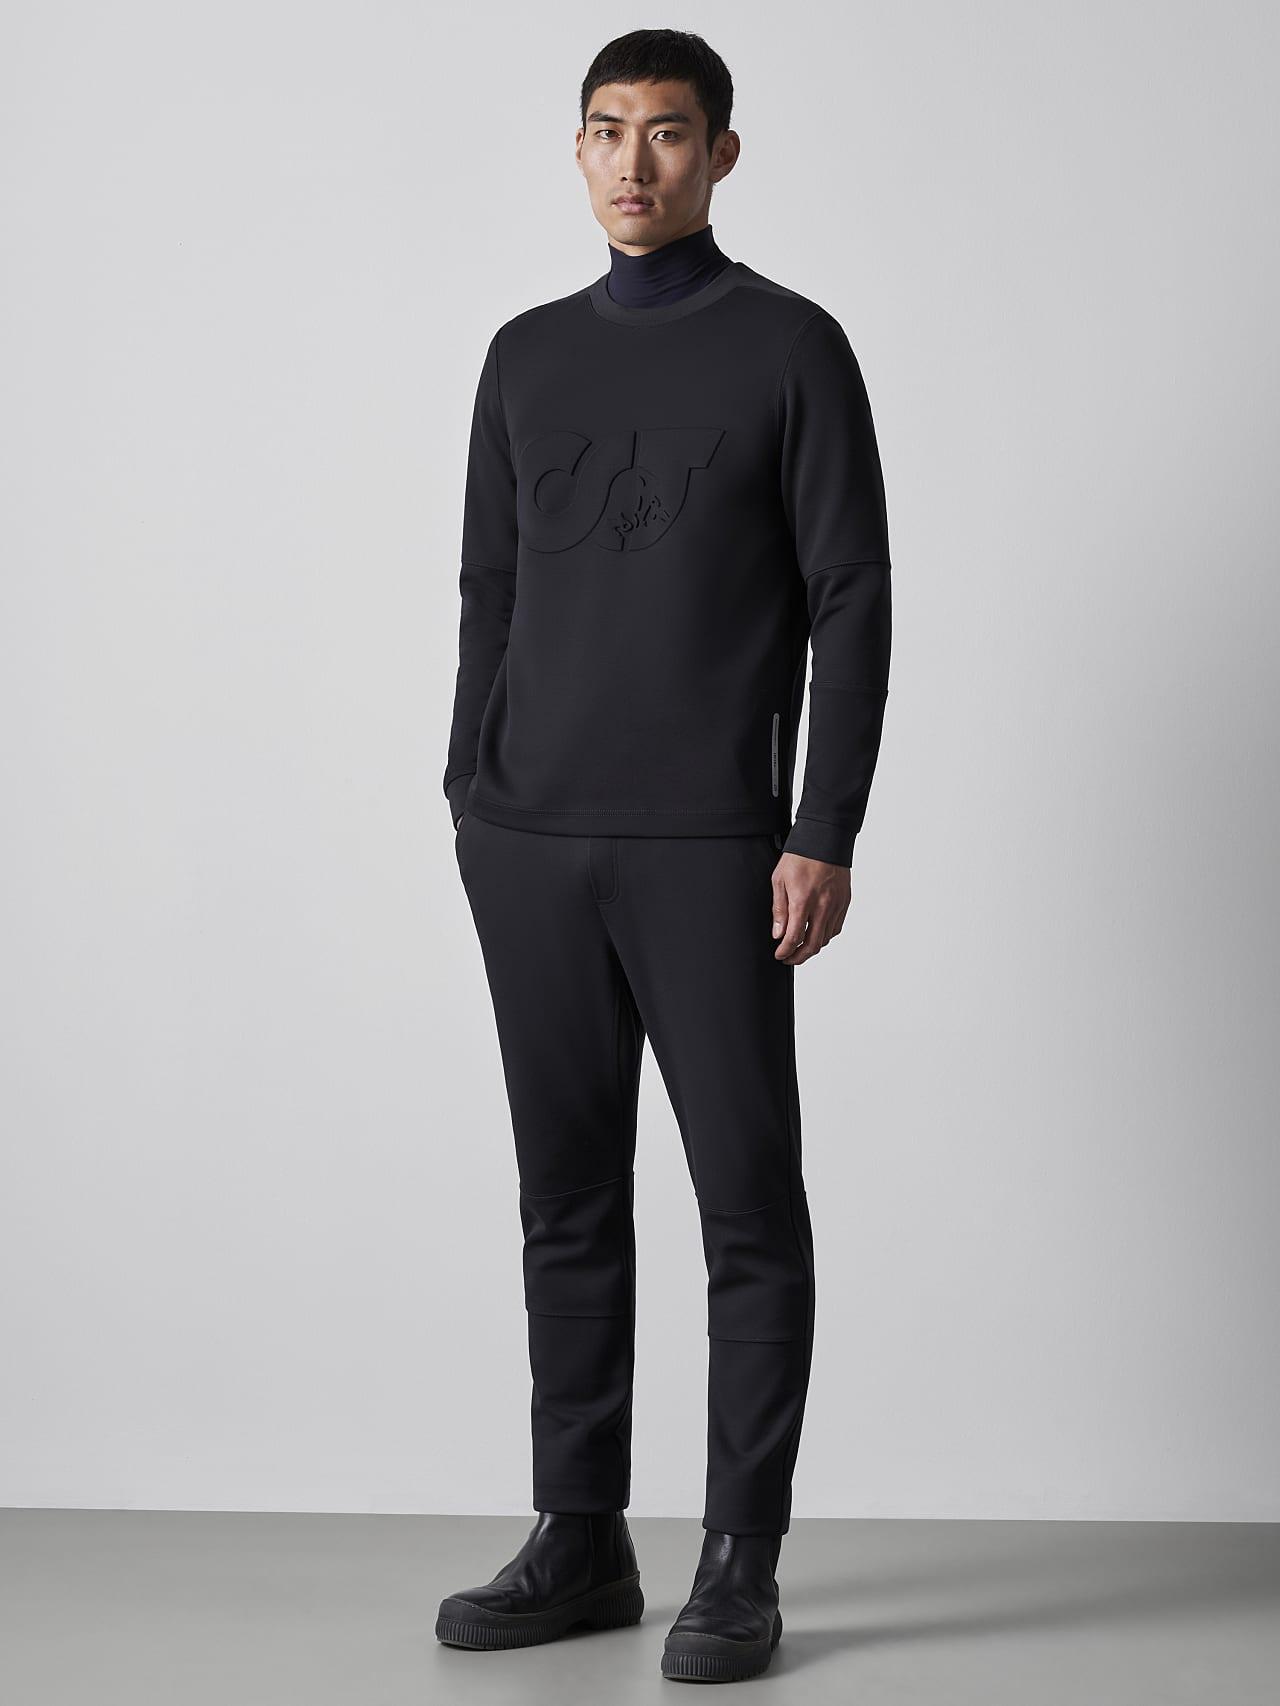 PRYK V7.Y5.02 Premium Sweatpants black Model shot Alpha Tauri